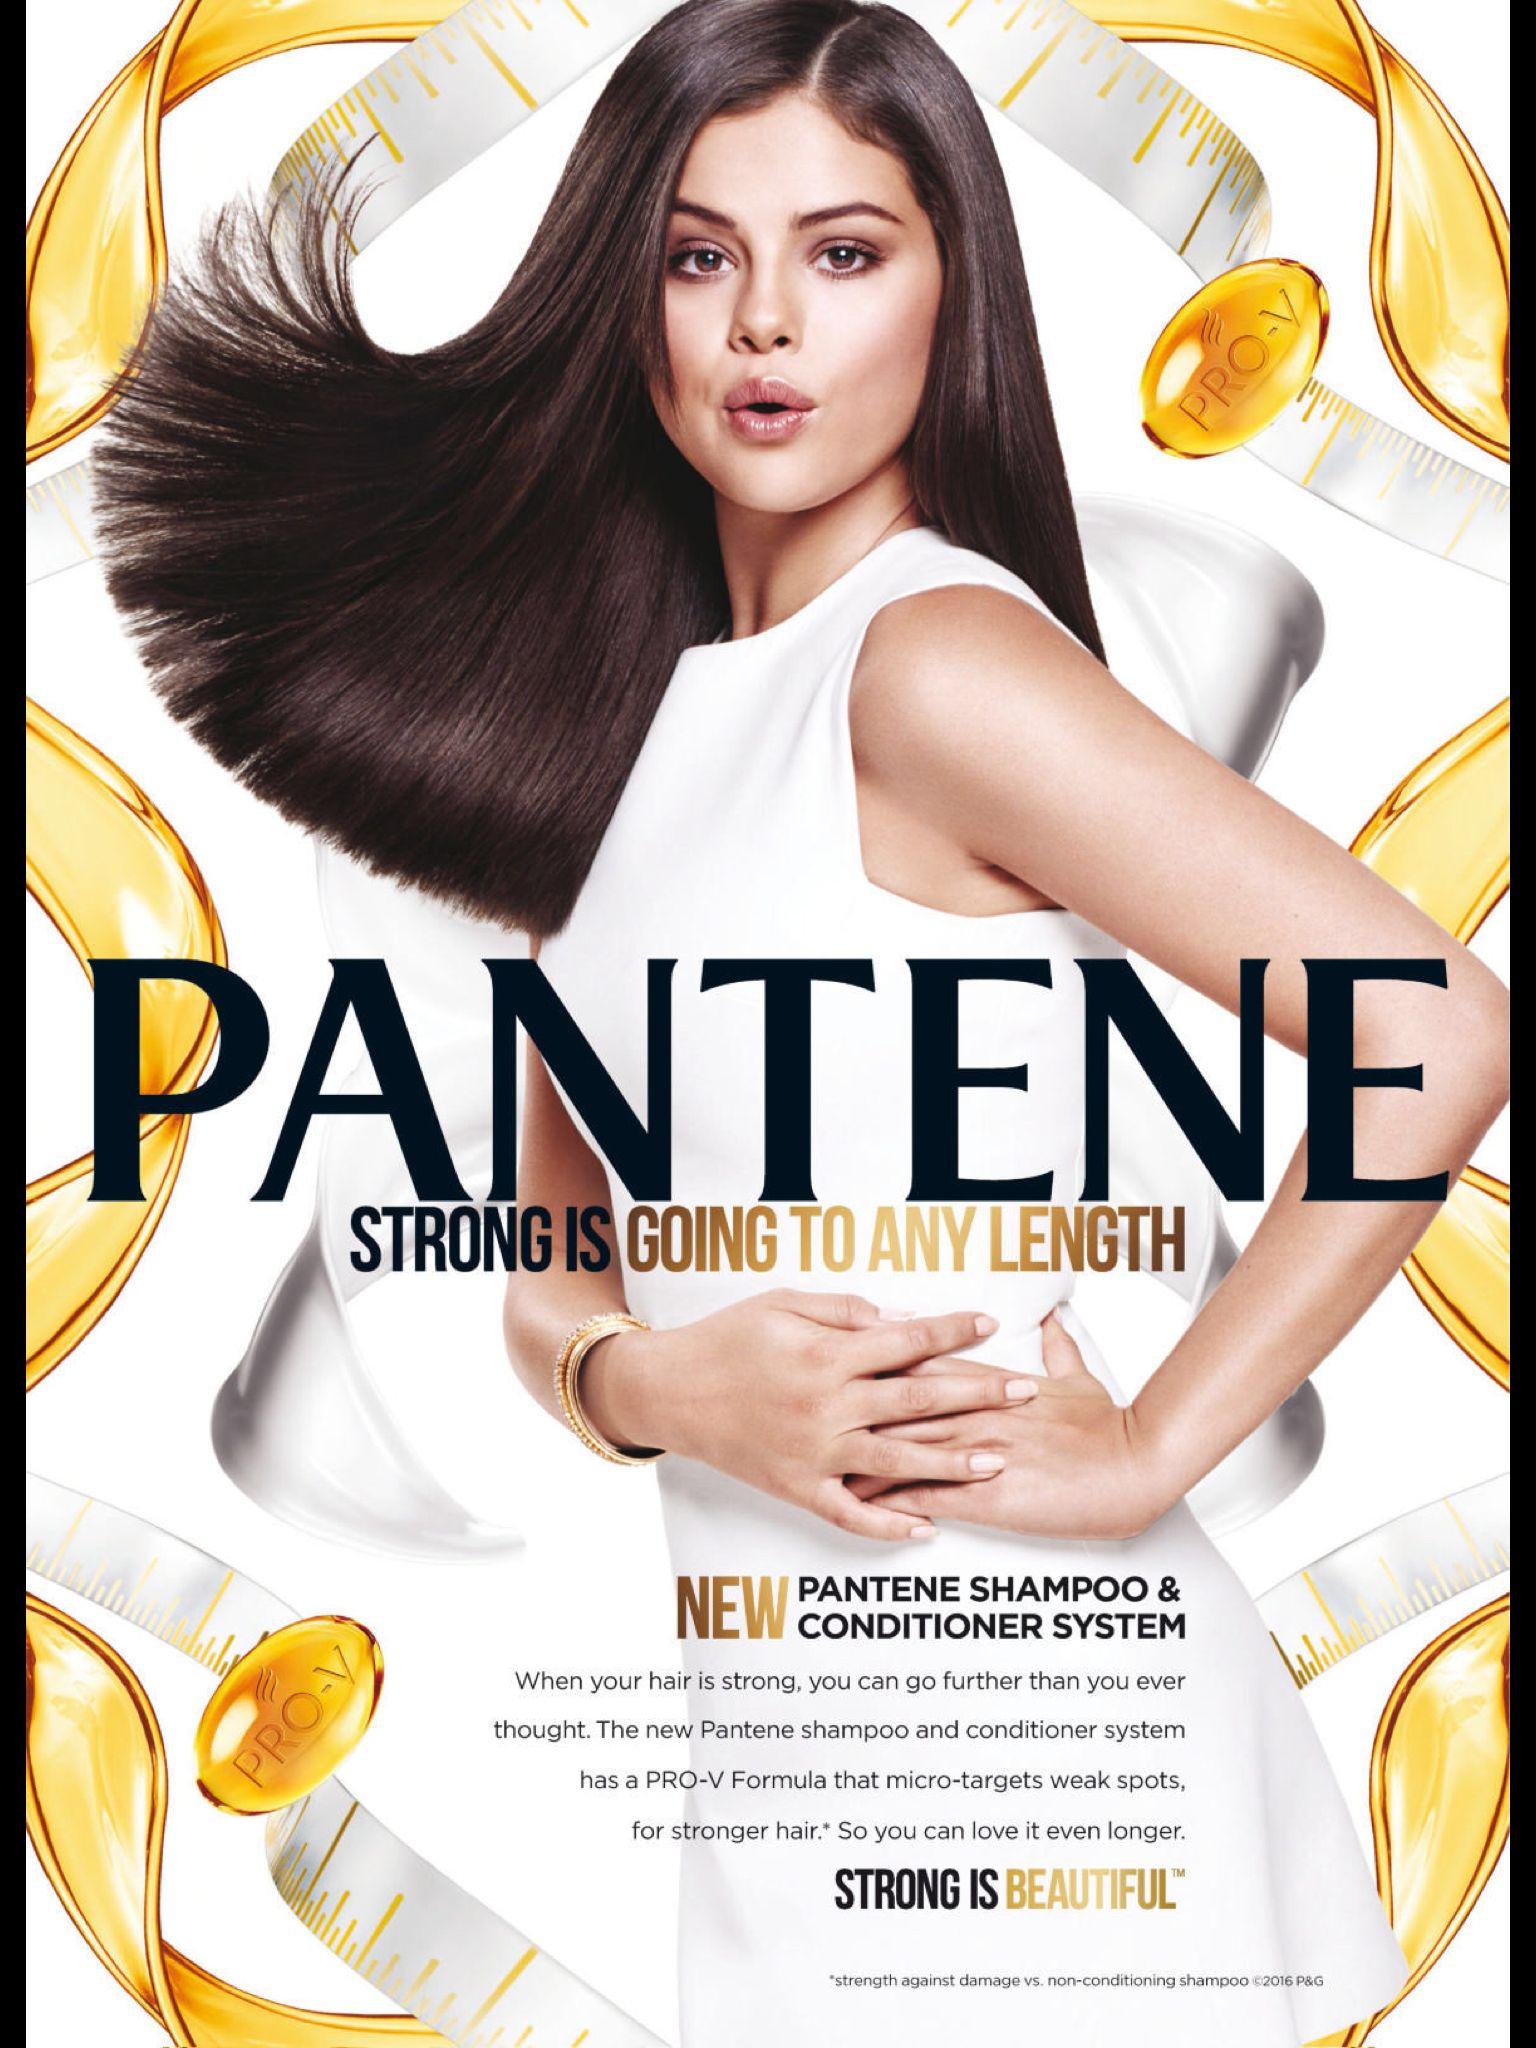 pantene | Pantene, Shampoo advertising, Pantene shampoo